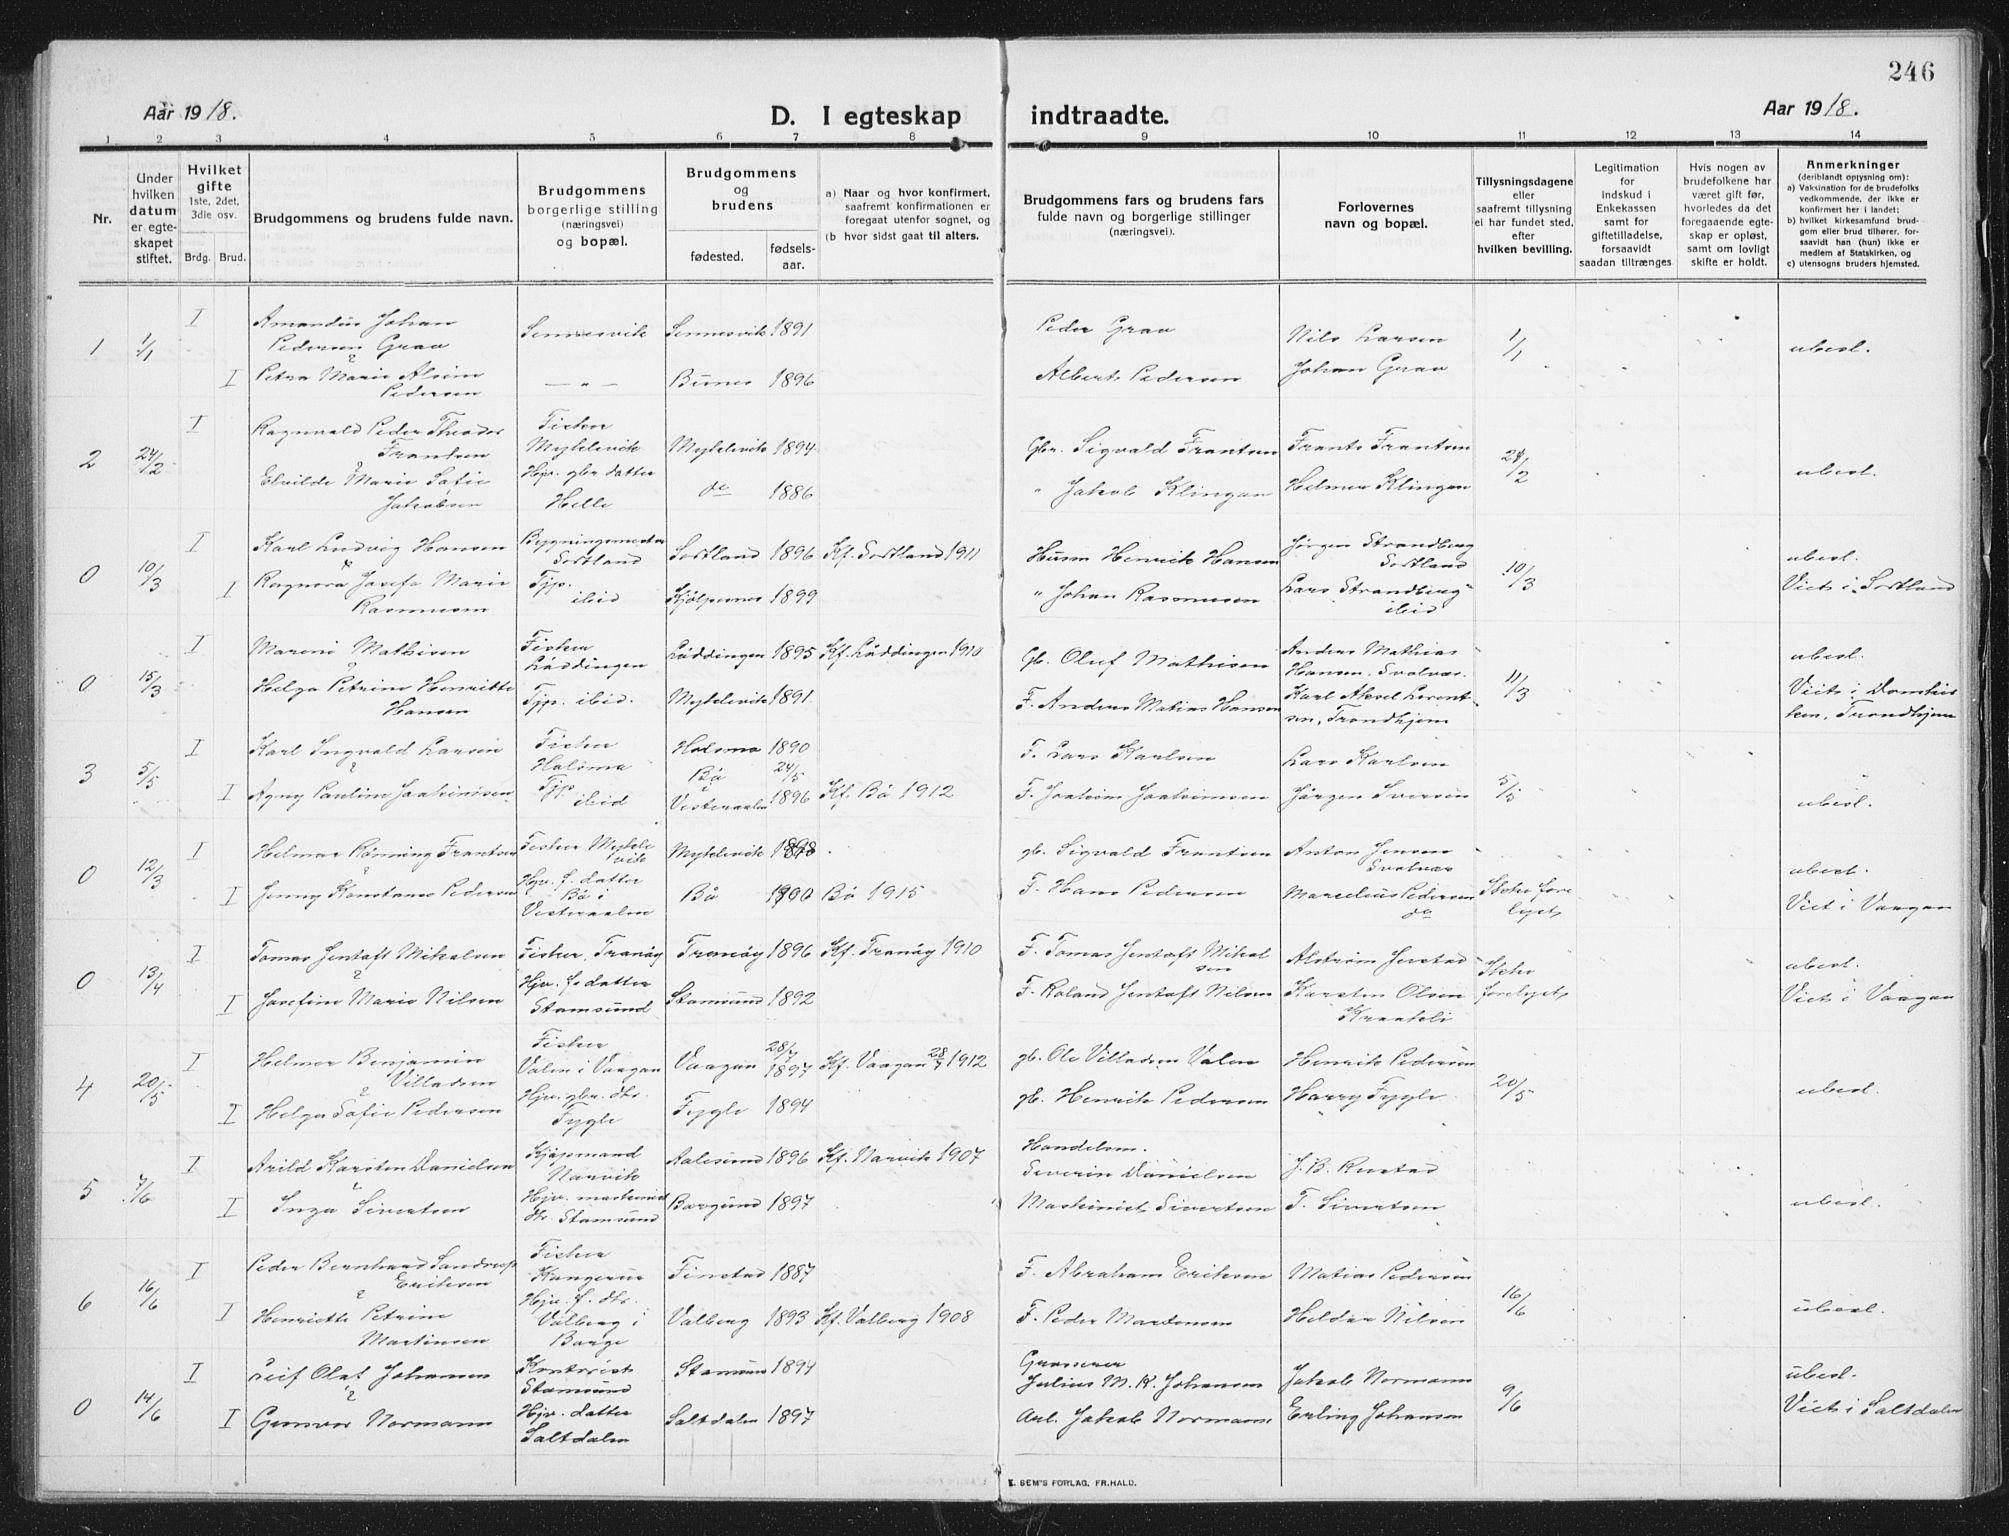 SAT, Ministerialprotokoller, klokkerbøker og fødselsregistre - Nordland, 882/L1183: Klokkerbok nr. 882C01, 1911-1938, s. 246